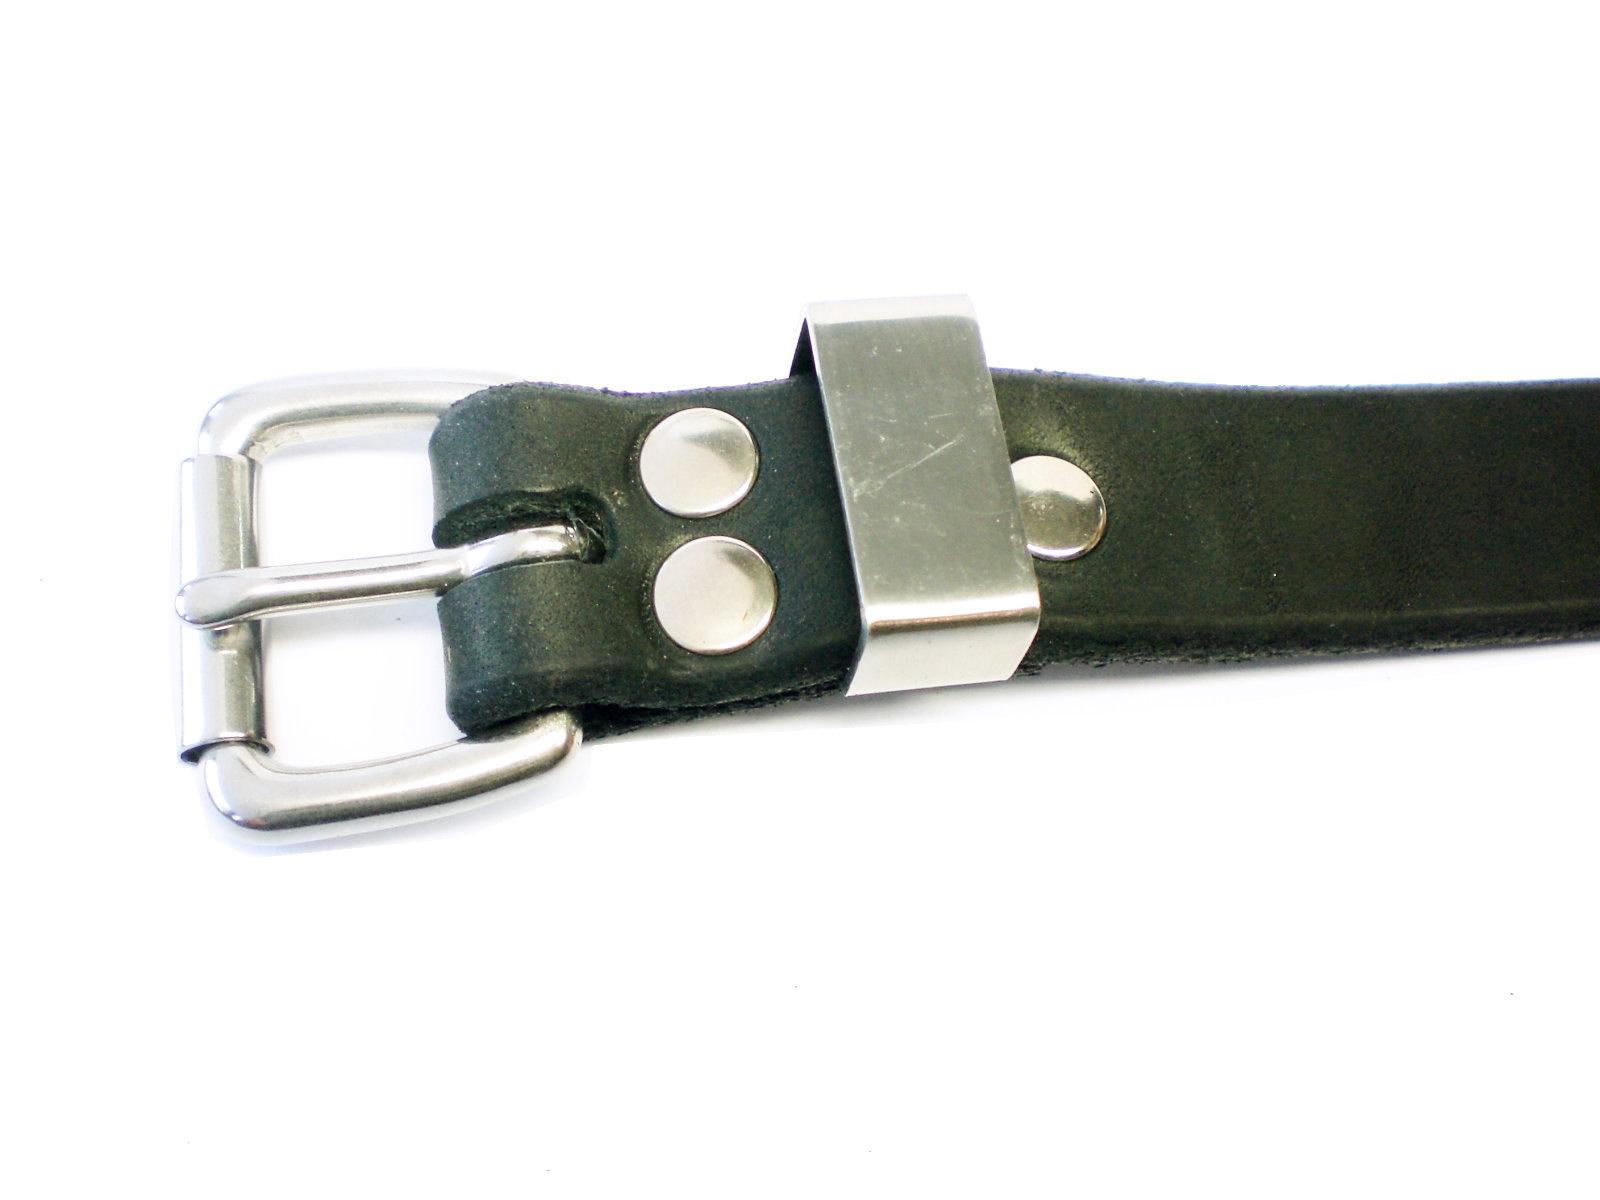 stainless steel buckle - stainless steel keeper